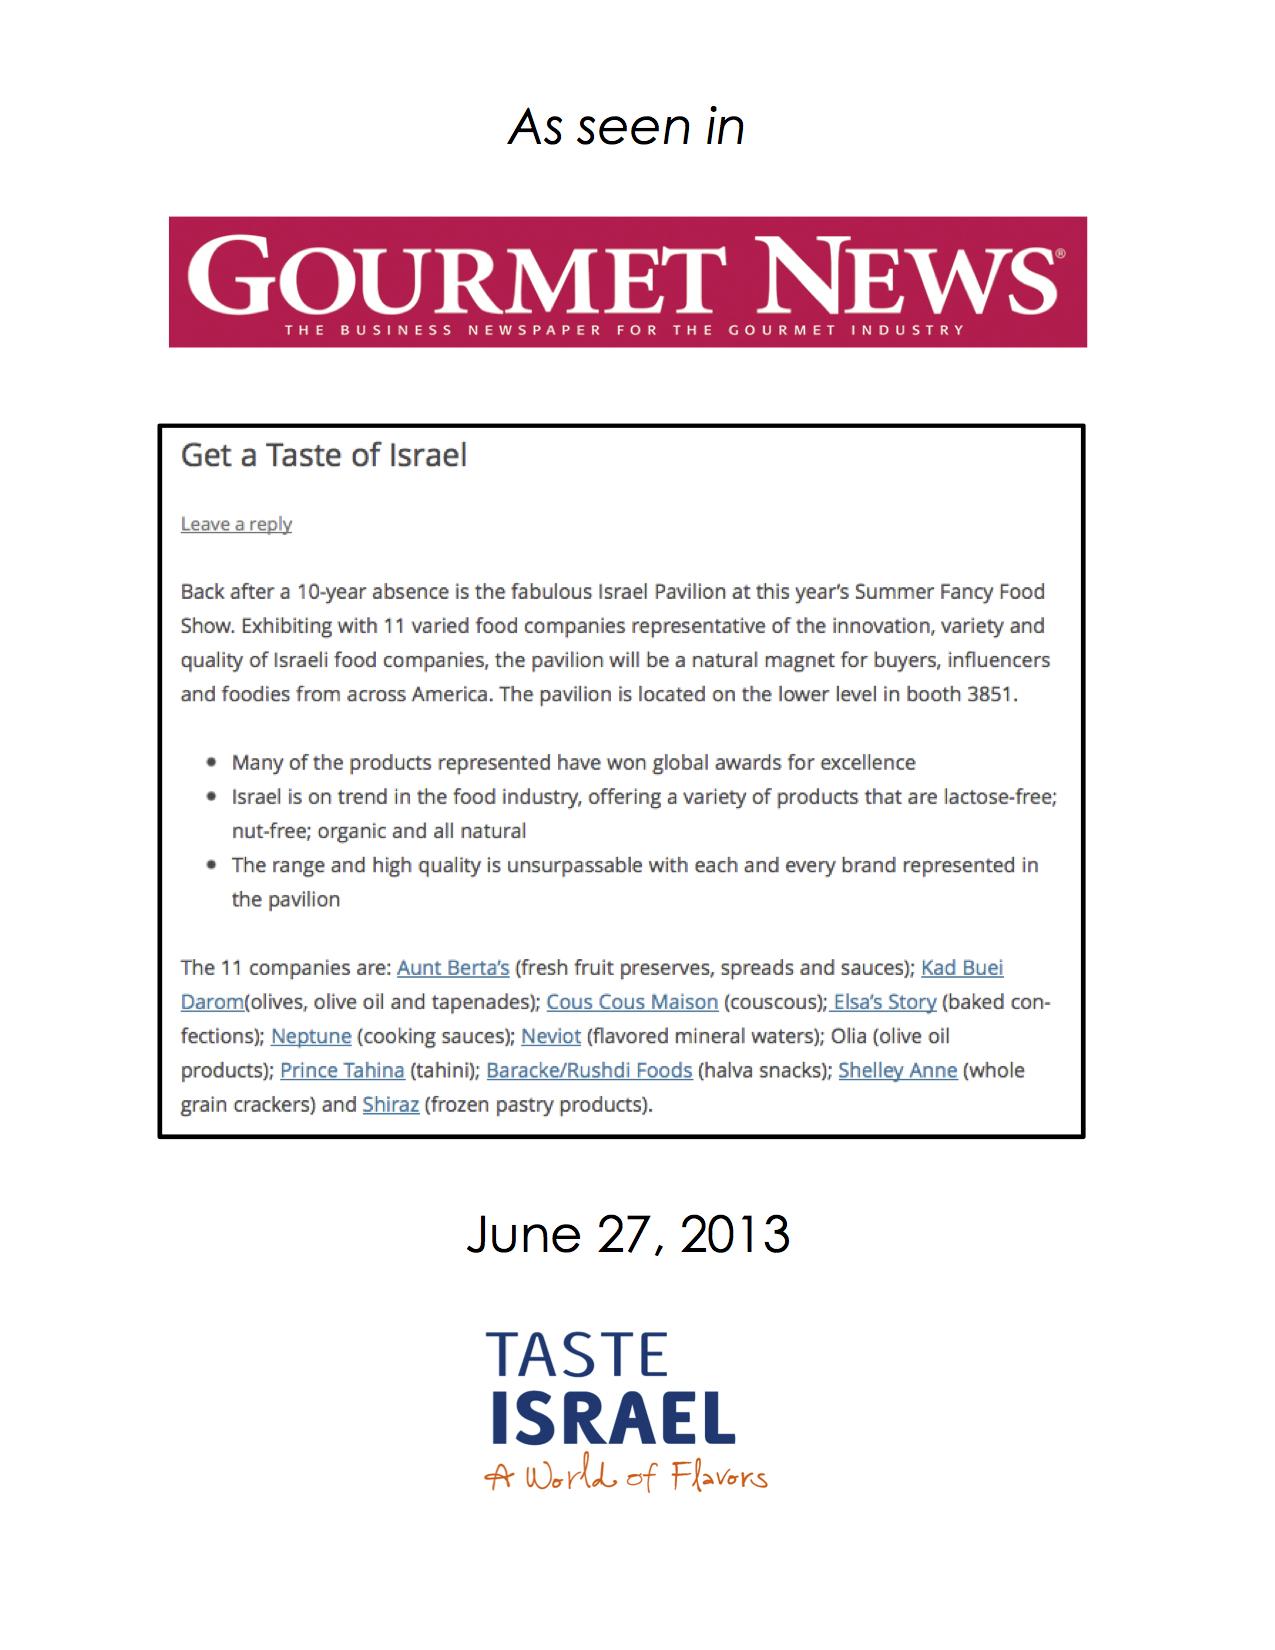 tasteofisrael-gourmetnews copy.jpg